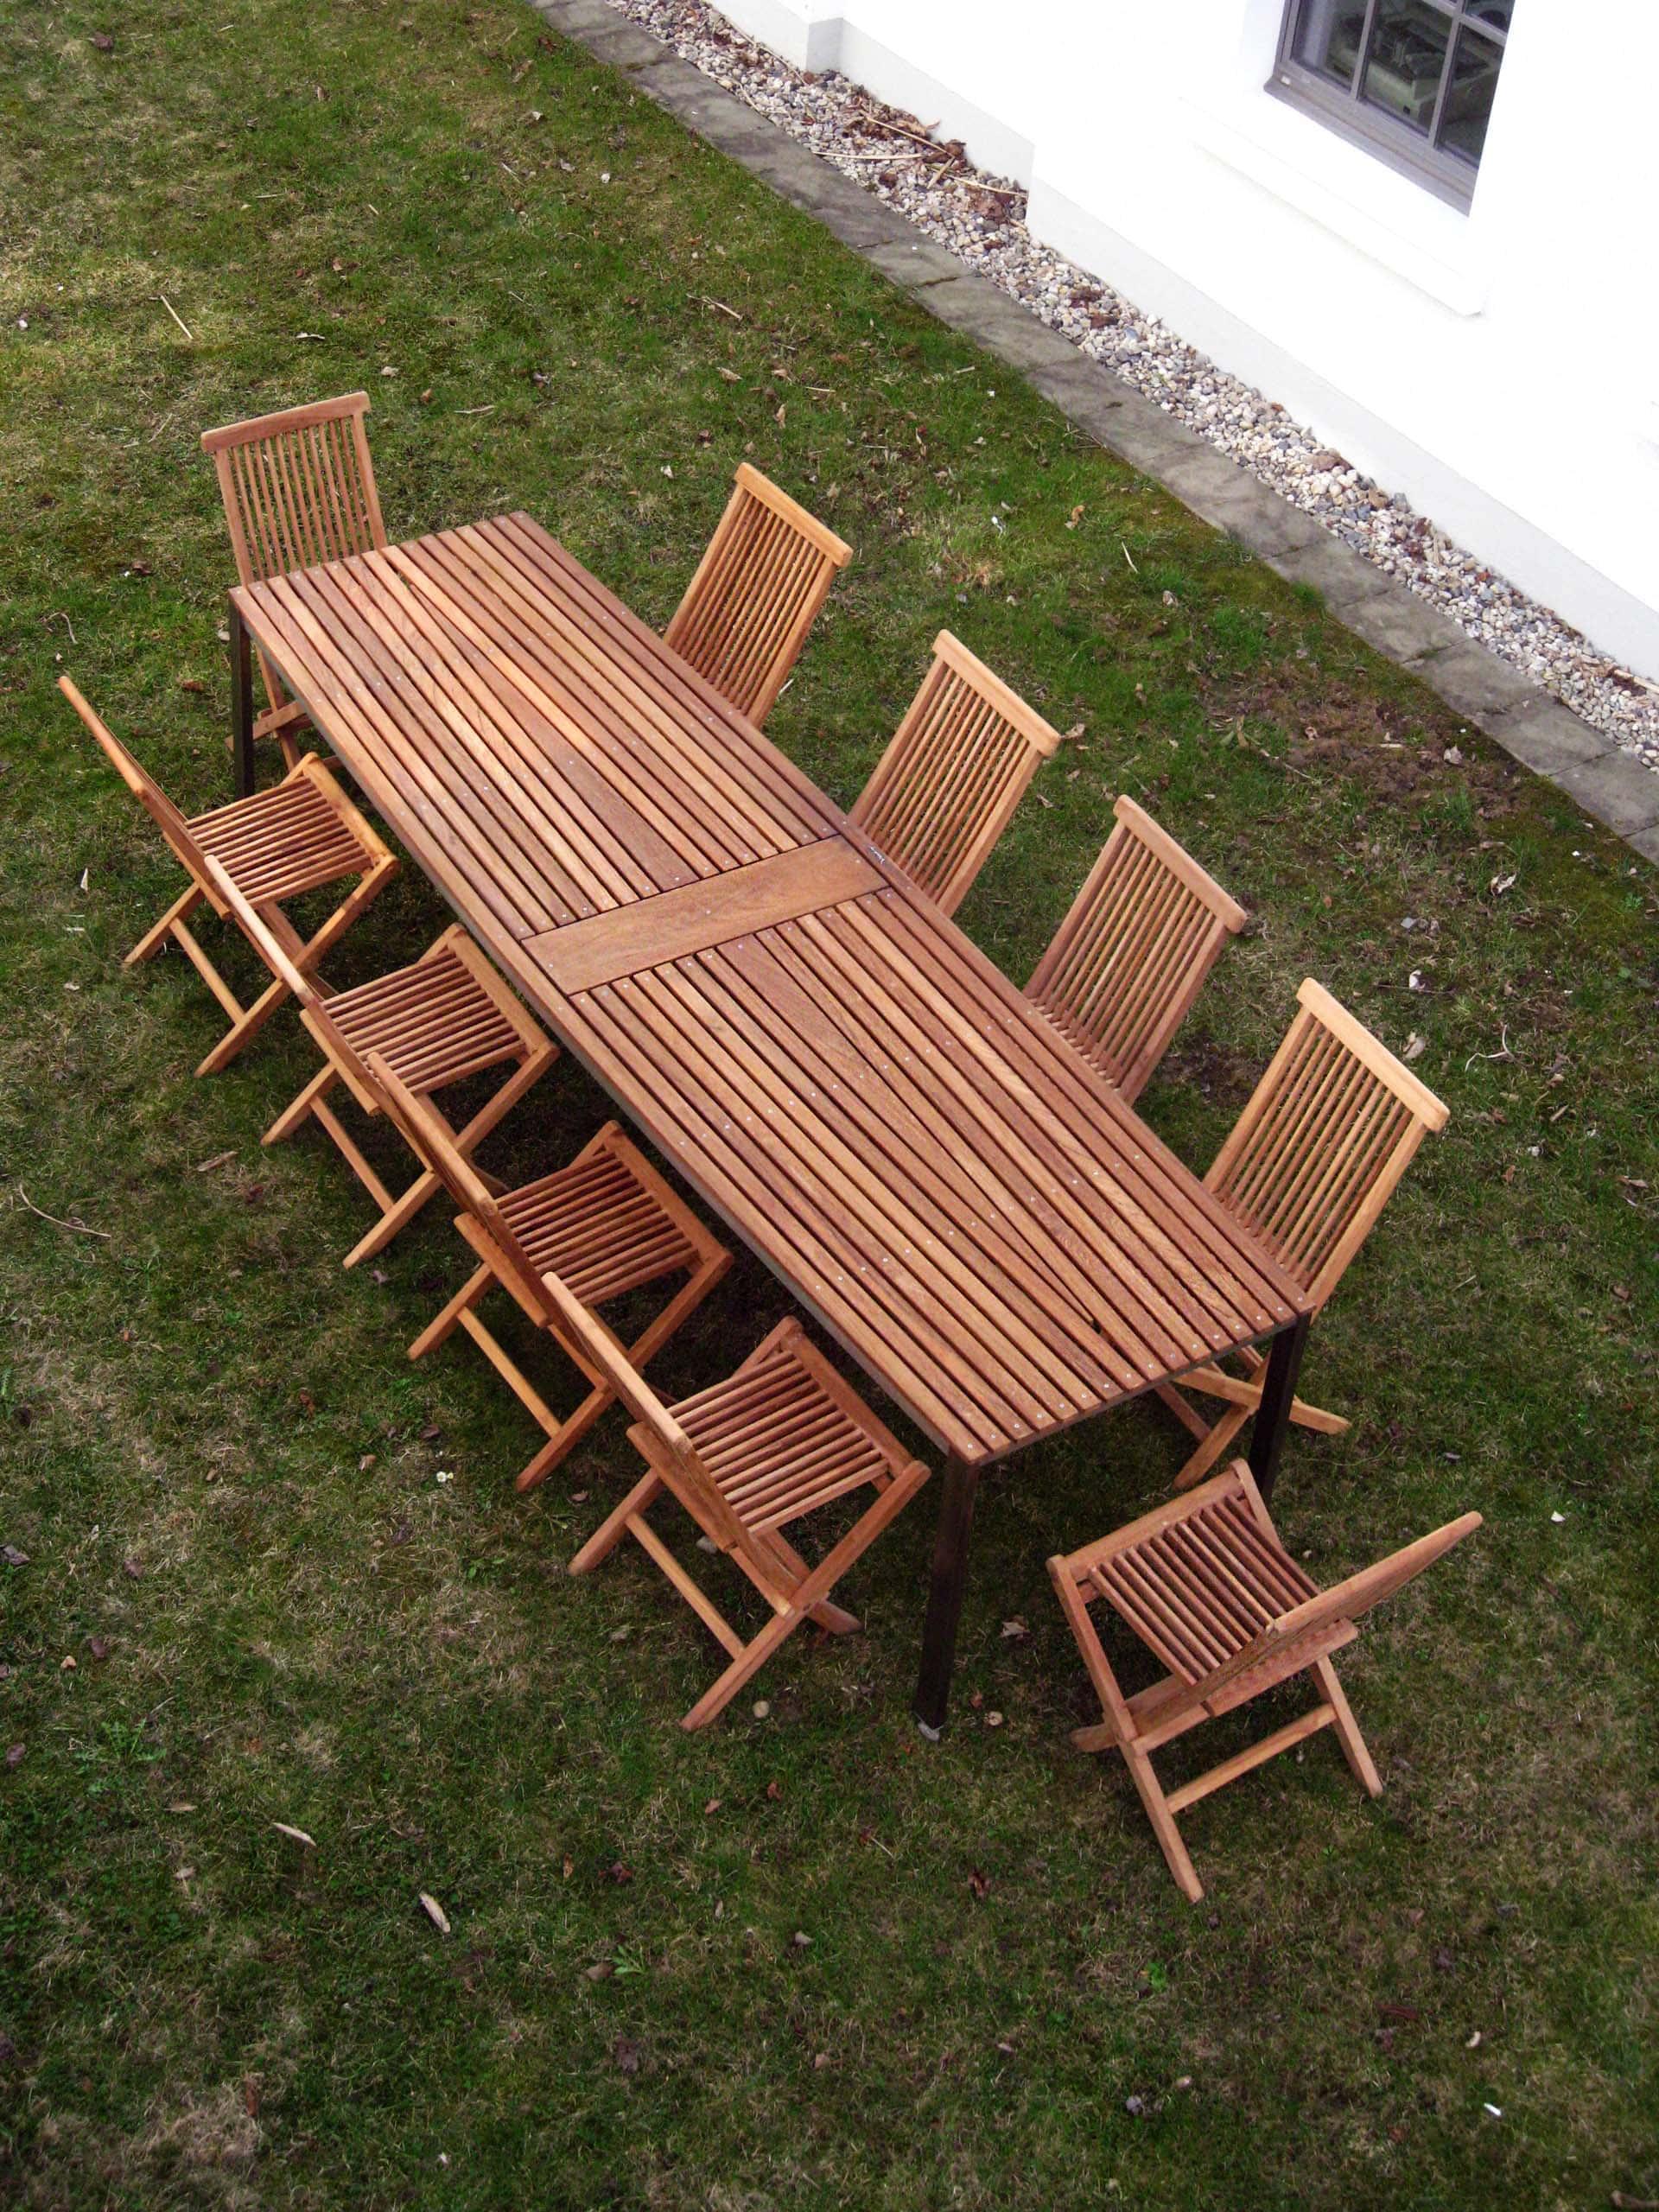 Design Tisch Sealine Nummer 4 aus Holz Metall Edelstahl by Sebastian Bohry timeless design